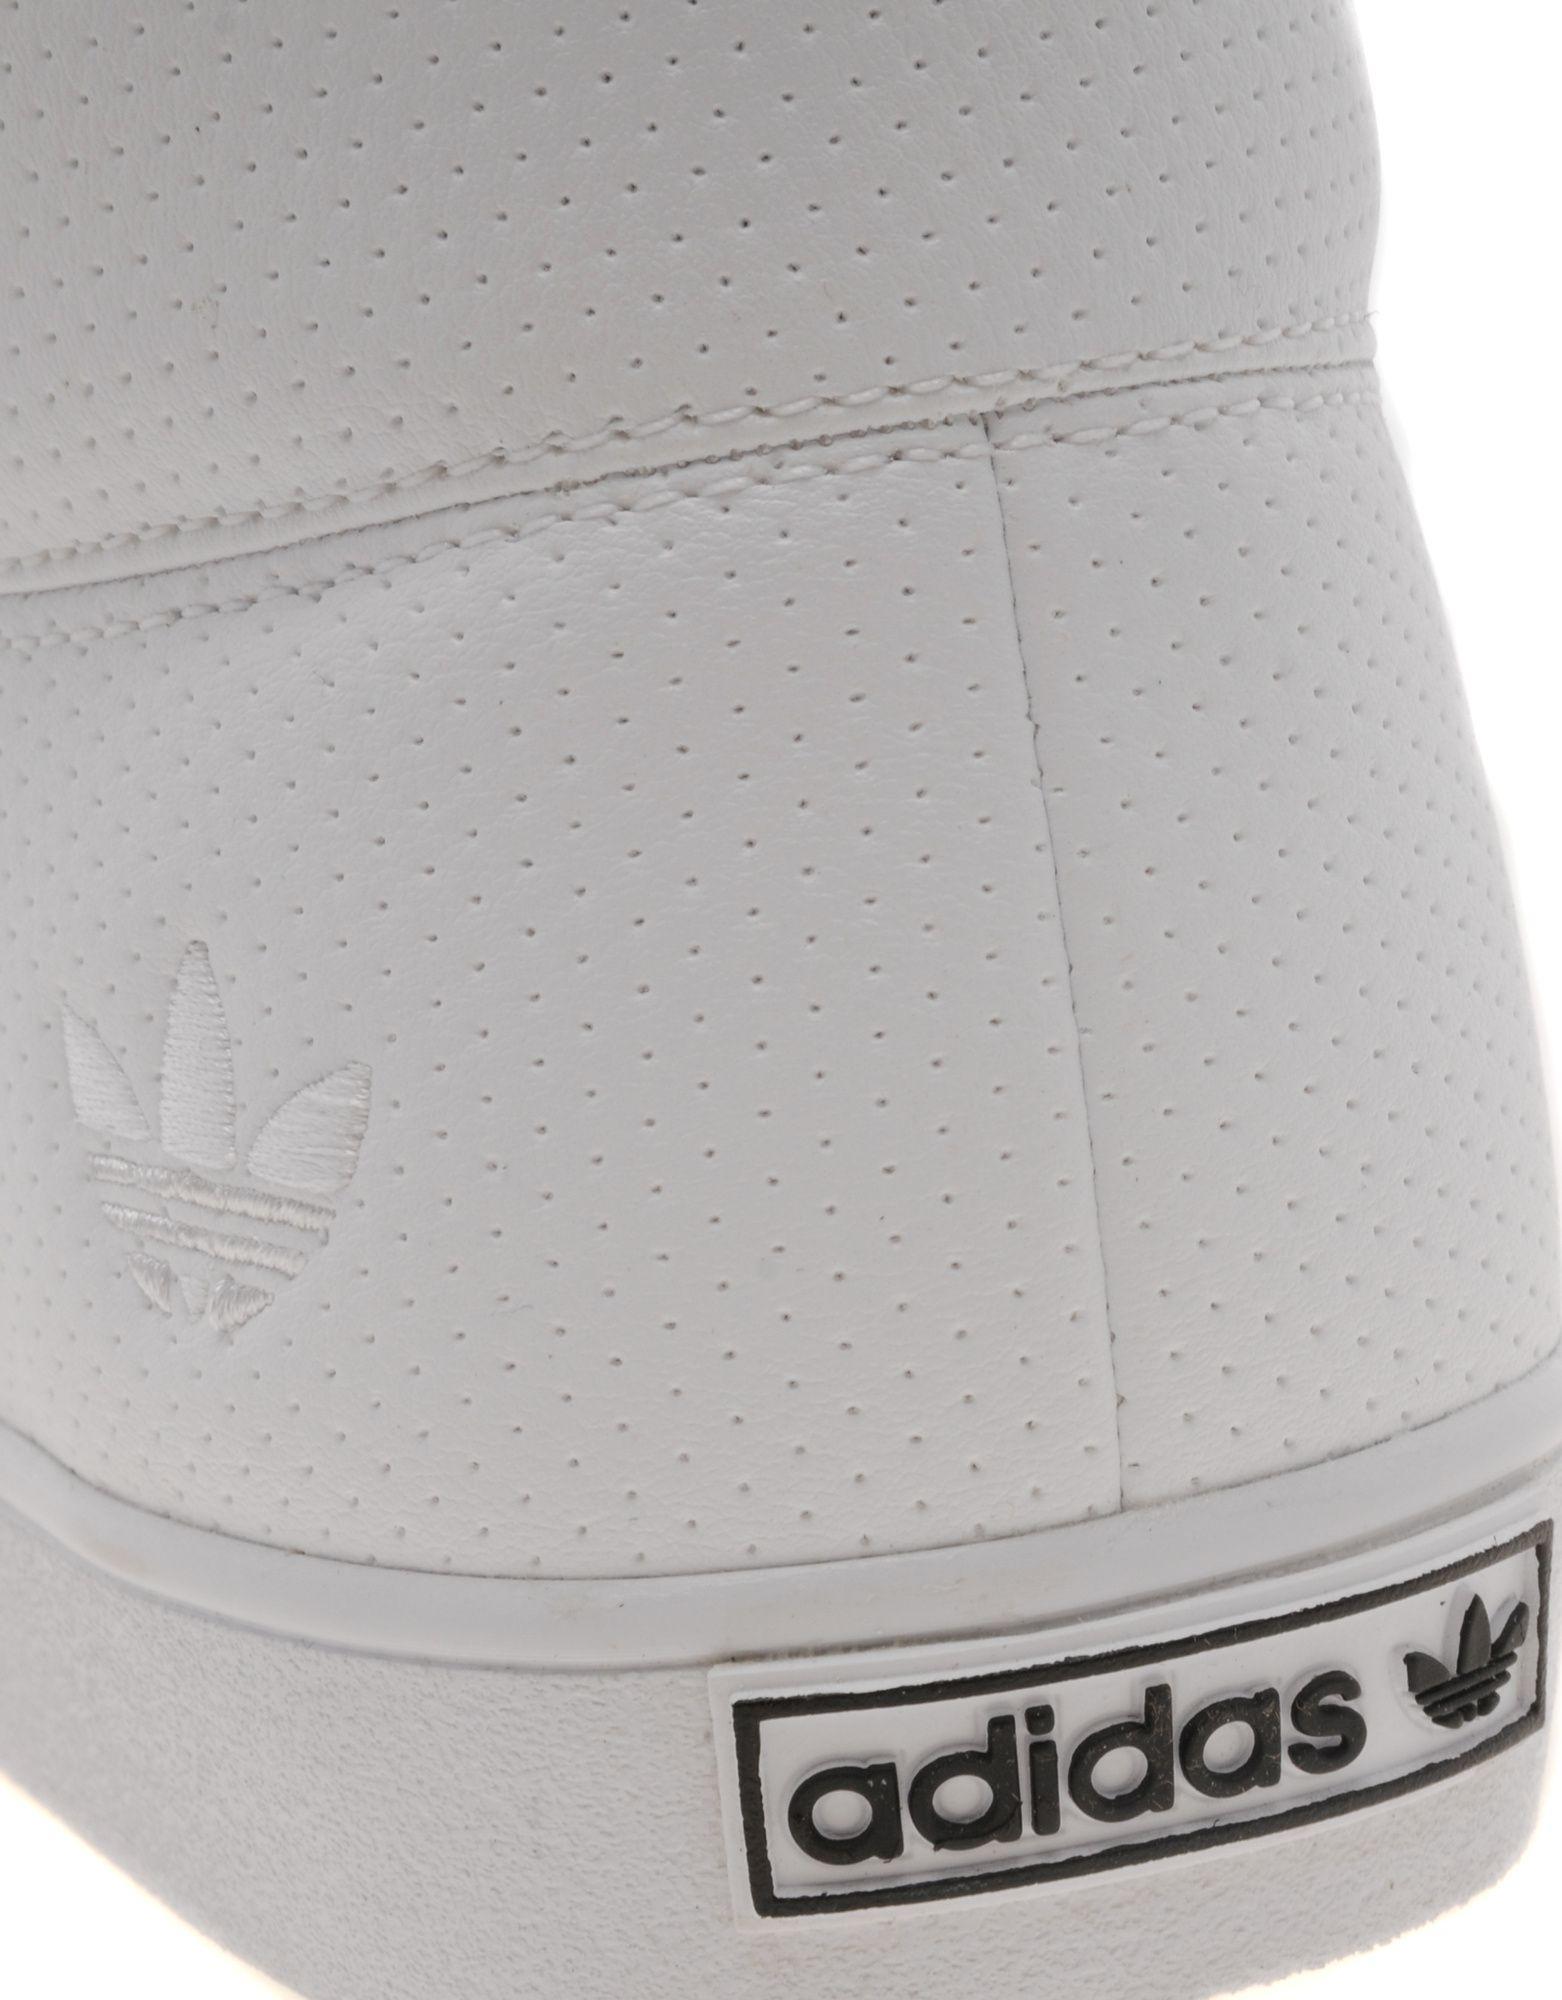 adidas Originals Indoor Tennis Mid